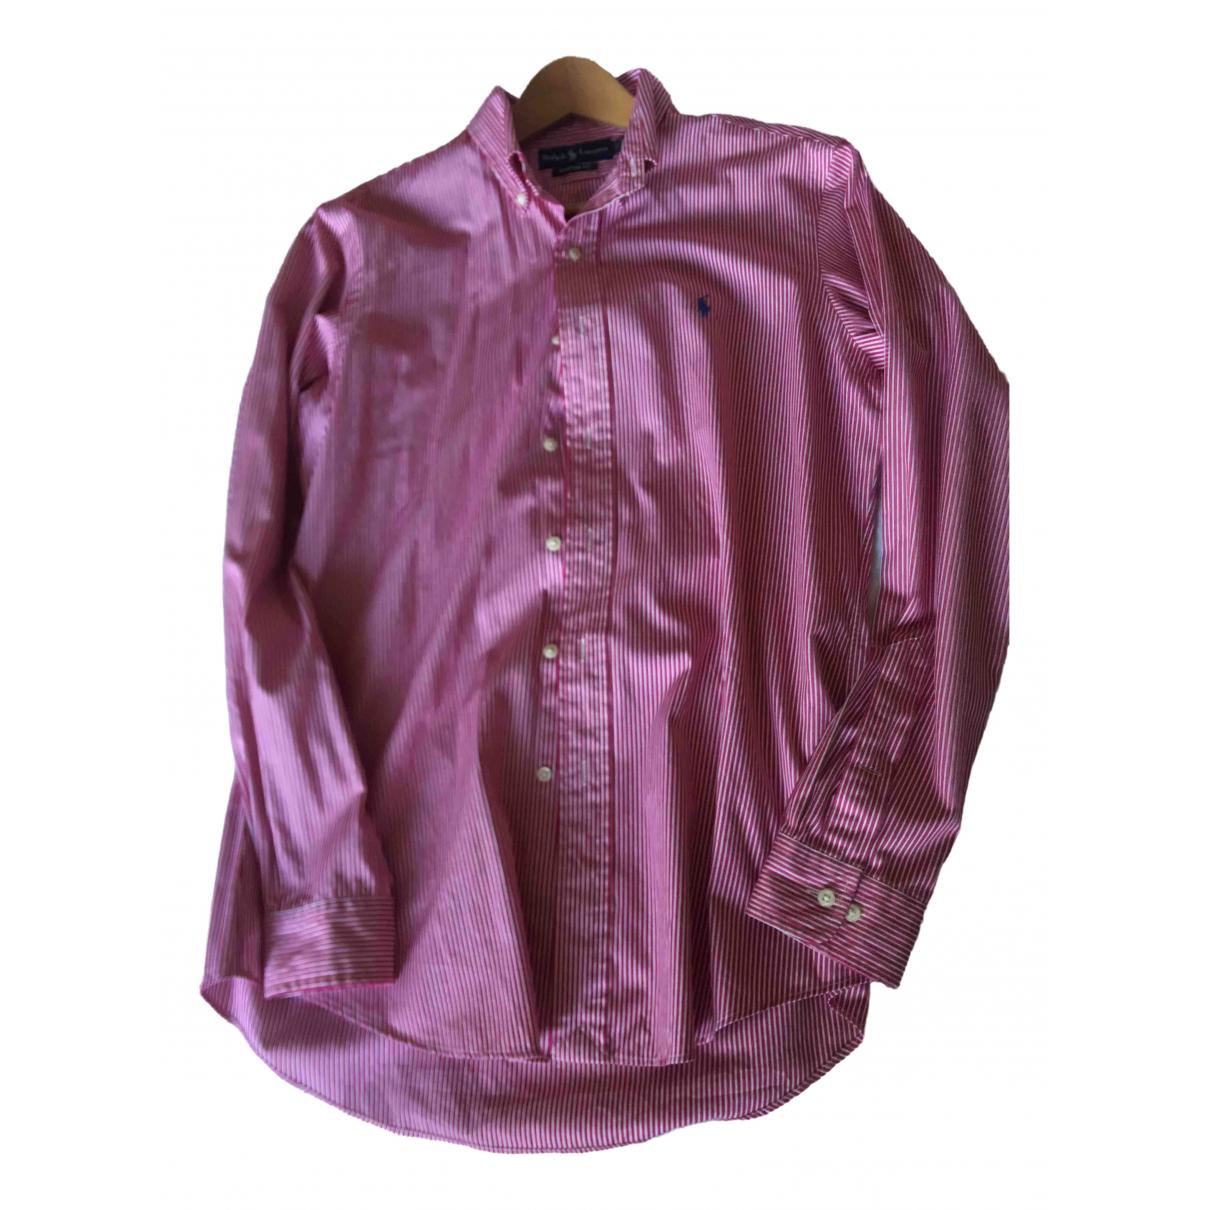 Ralph Lauren \N Burgundy Cotton Shirts for Men 15.5 UK - US (tour de cou / collar)